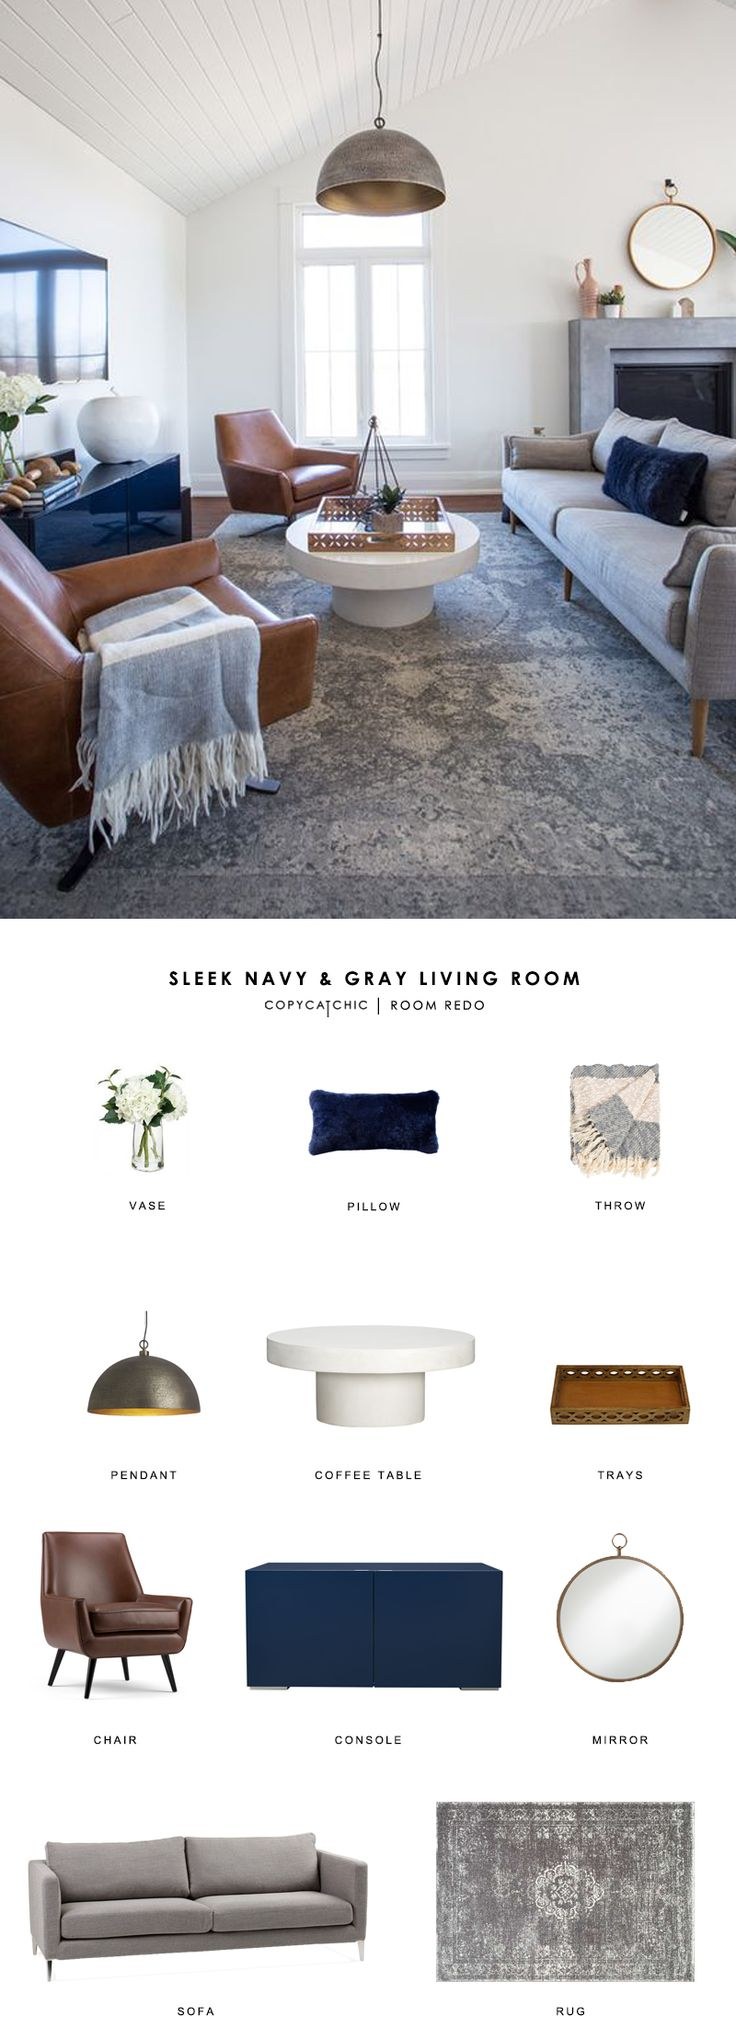 Copy Cat Chic Room Redo   Sleek Navy and Gray Living Room